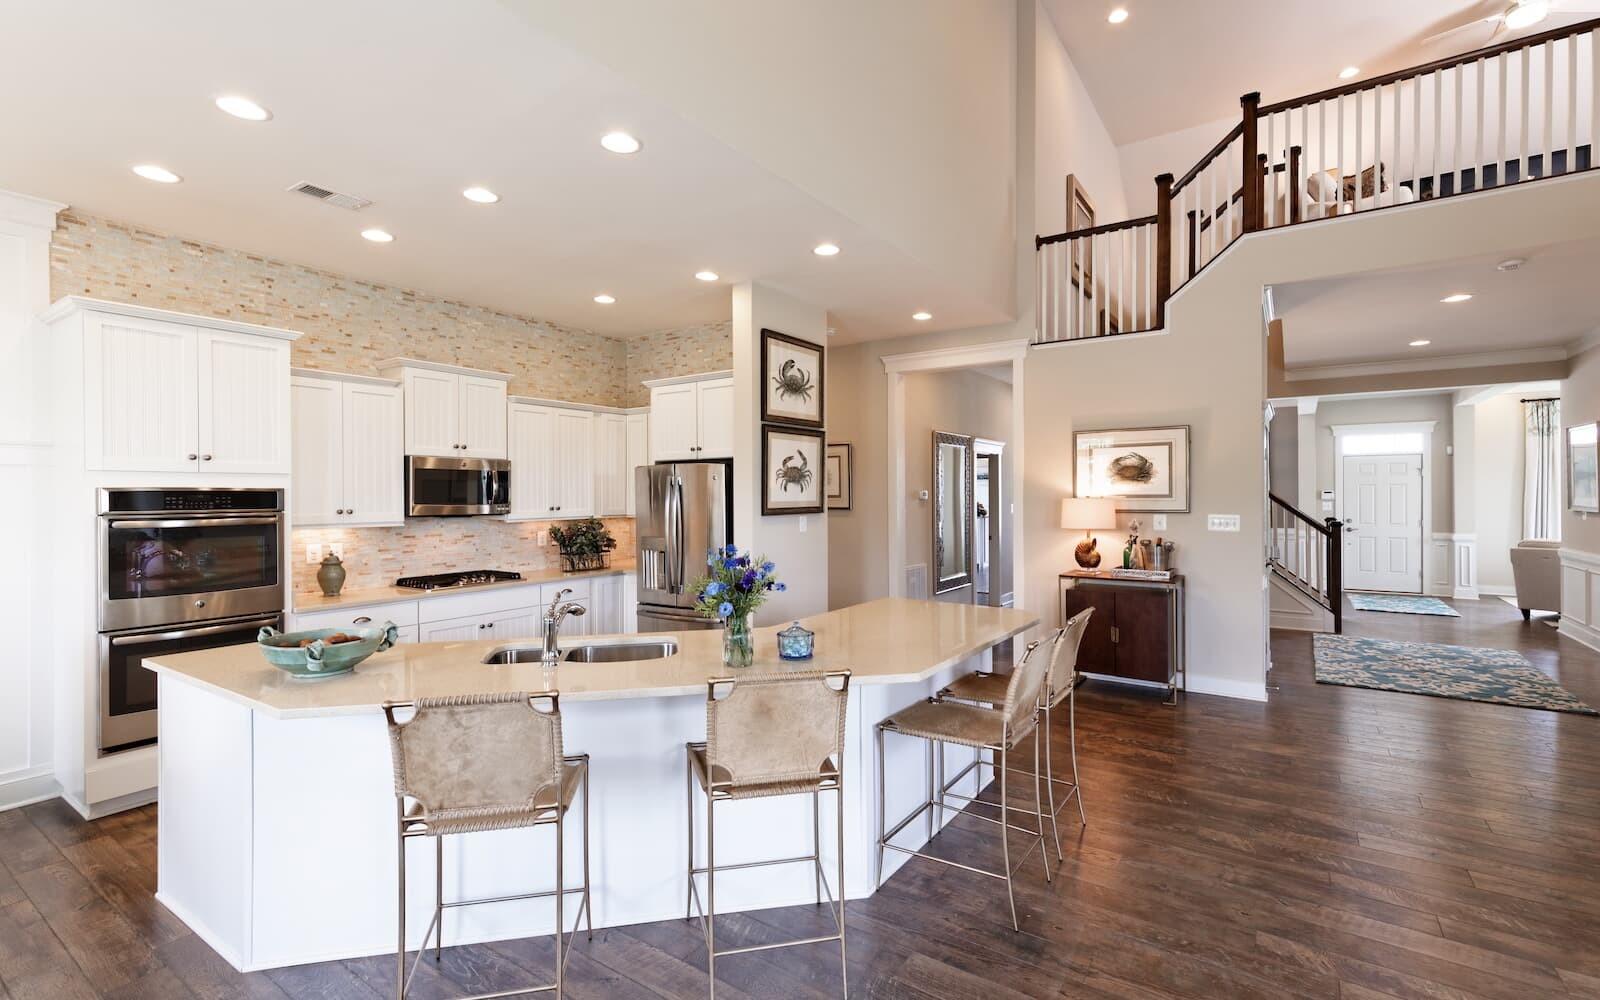 Pearson-kitchen1-single-family-homes-easton-md-easton-village-brookfield-residential.jpg